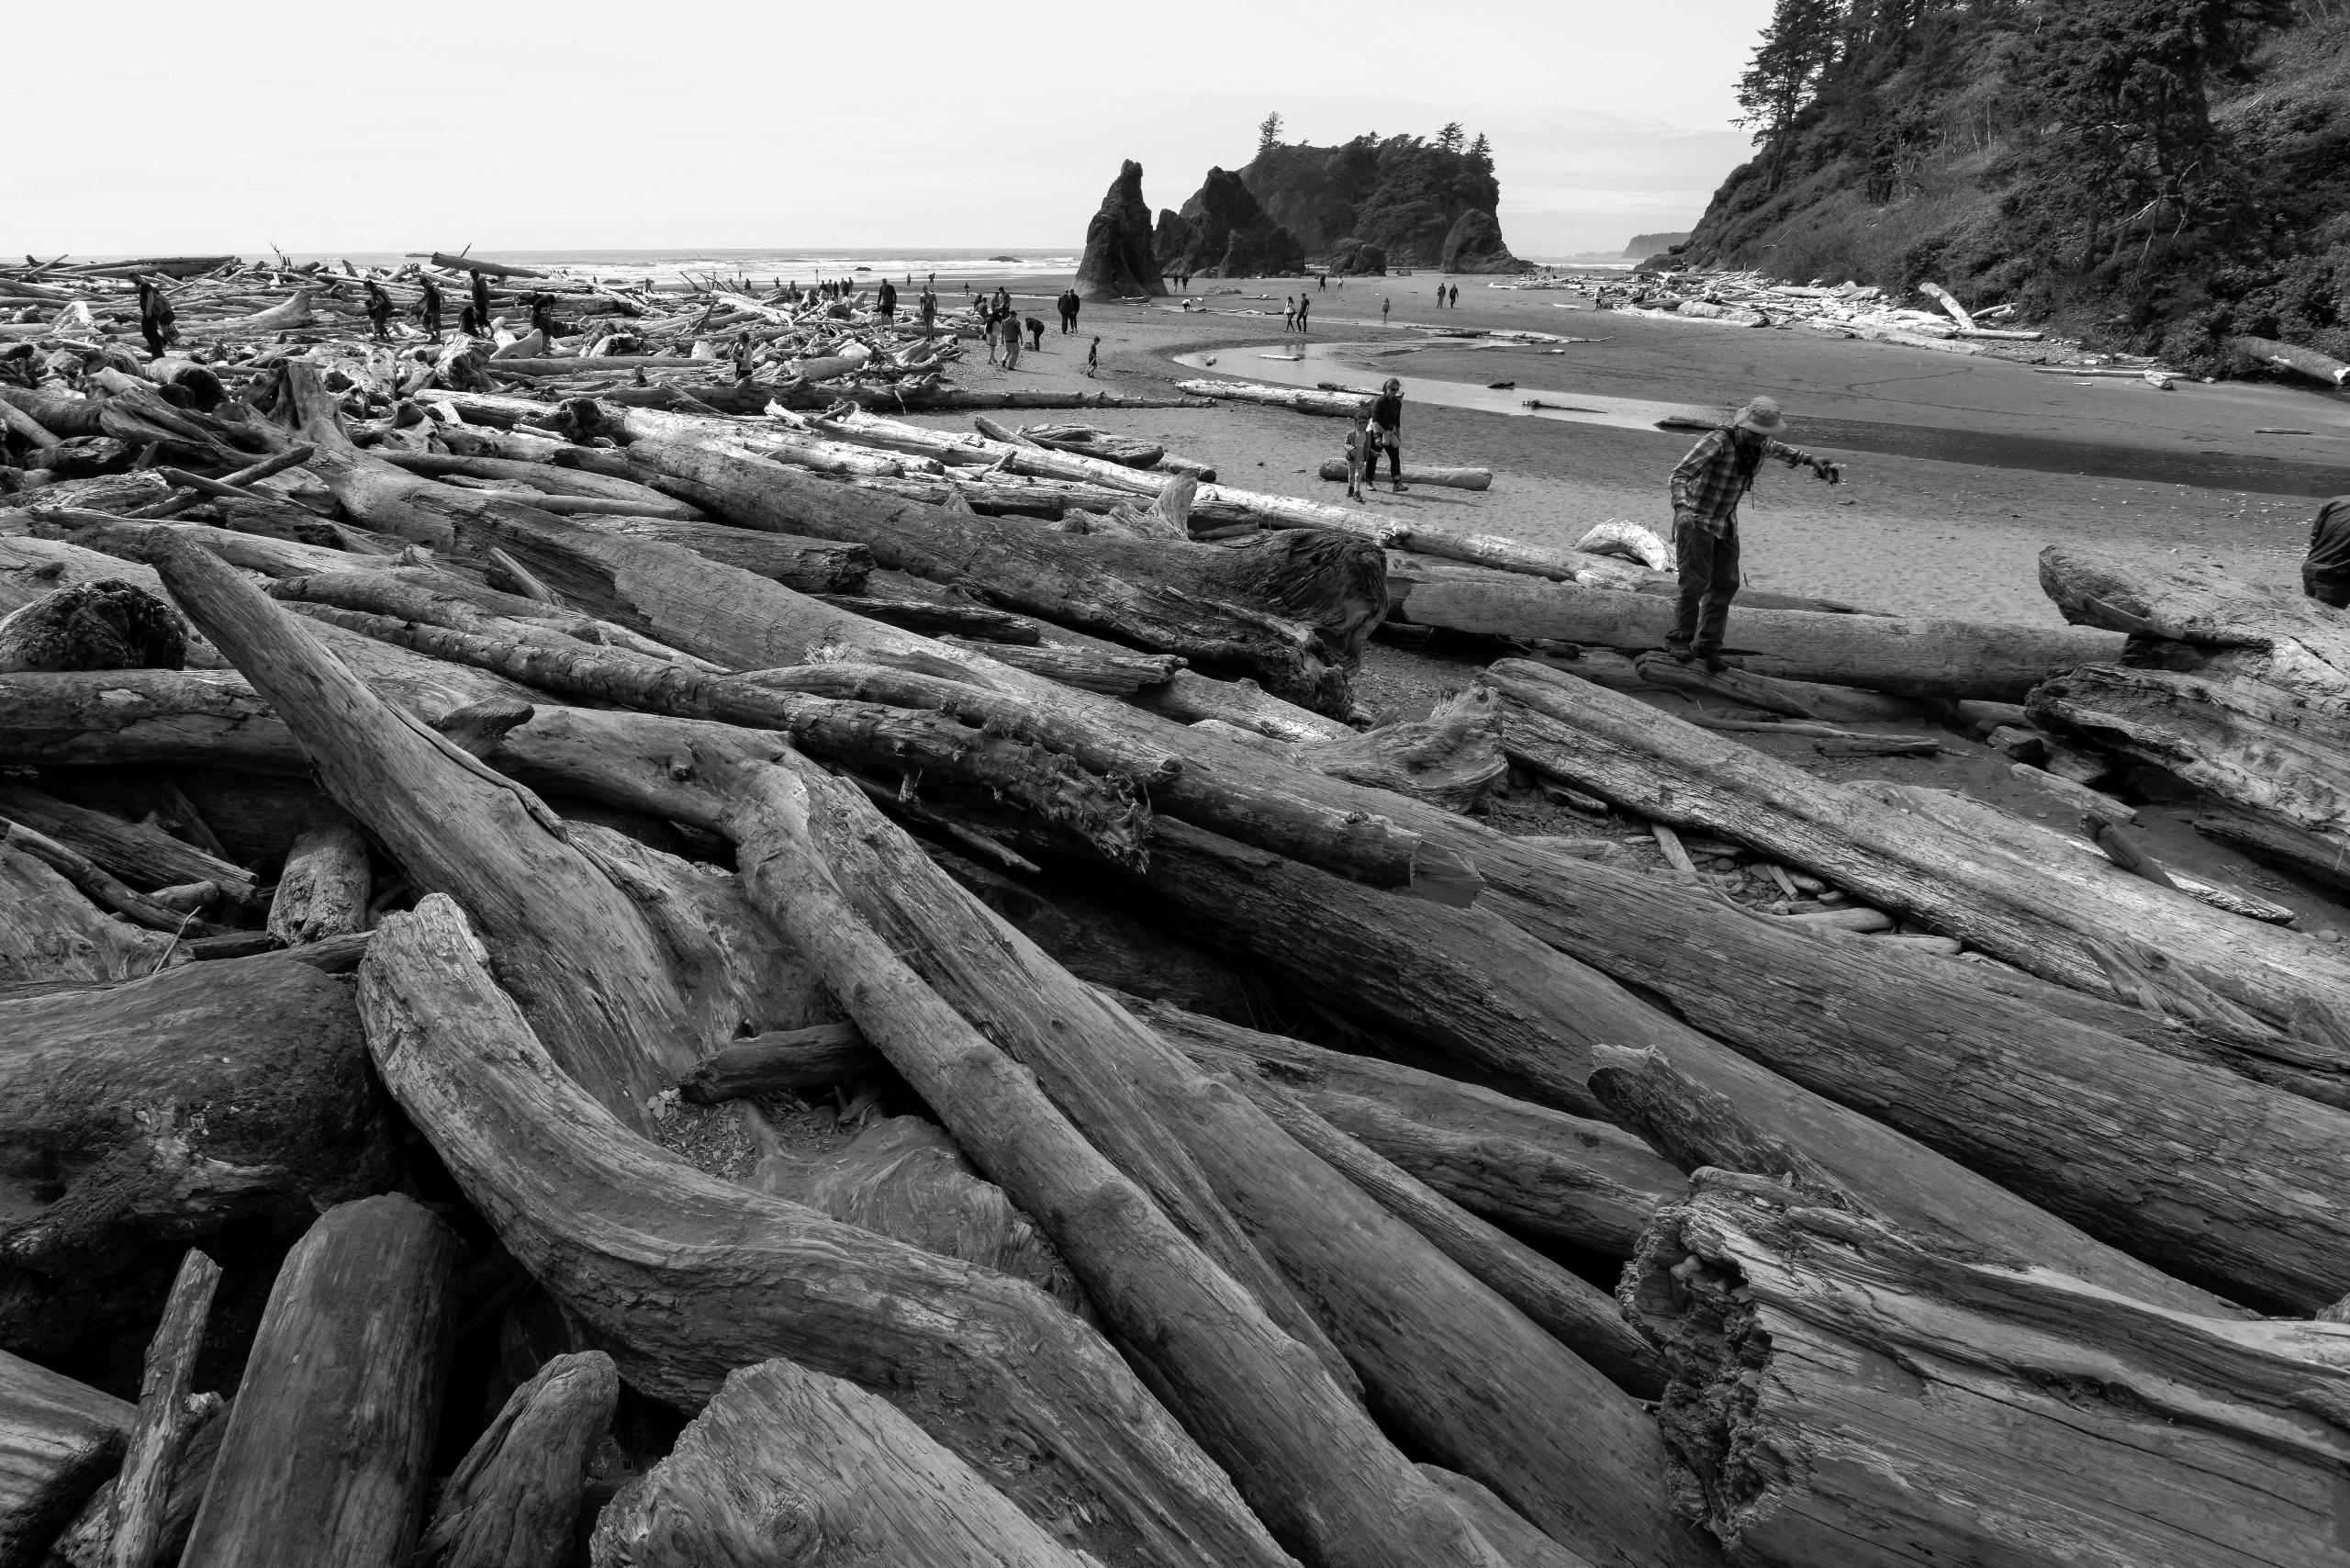 Beach - Ruby, Washington, nature - usnrmustang | ello